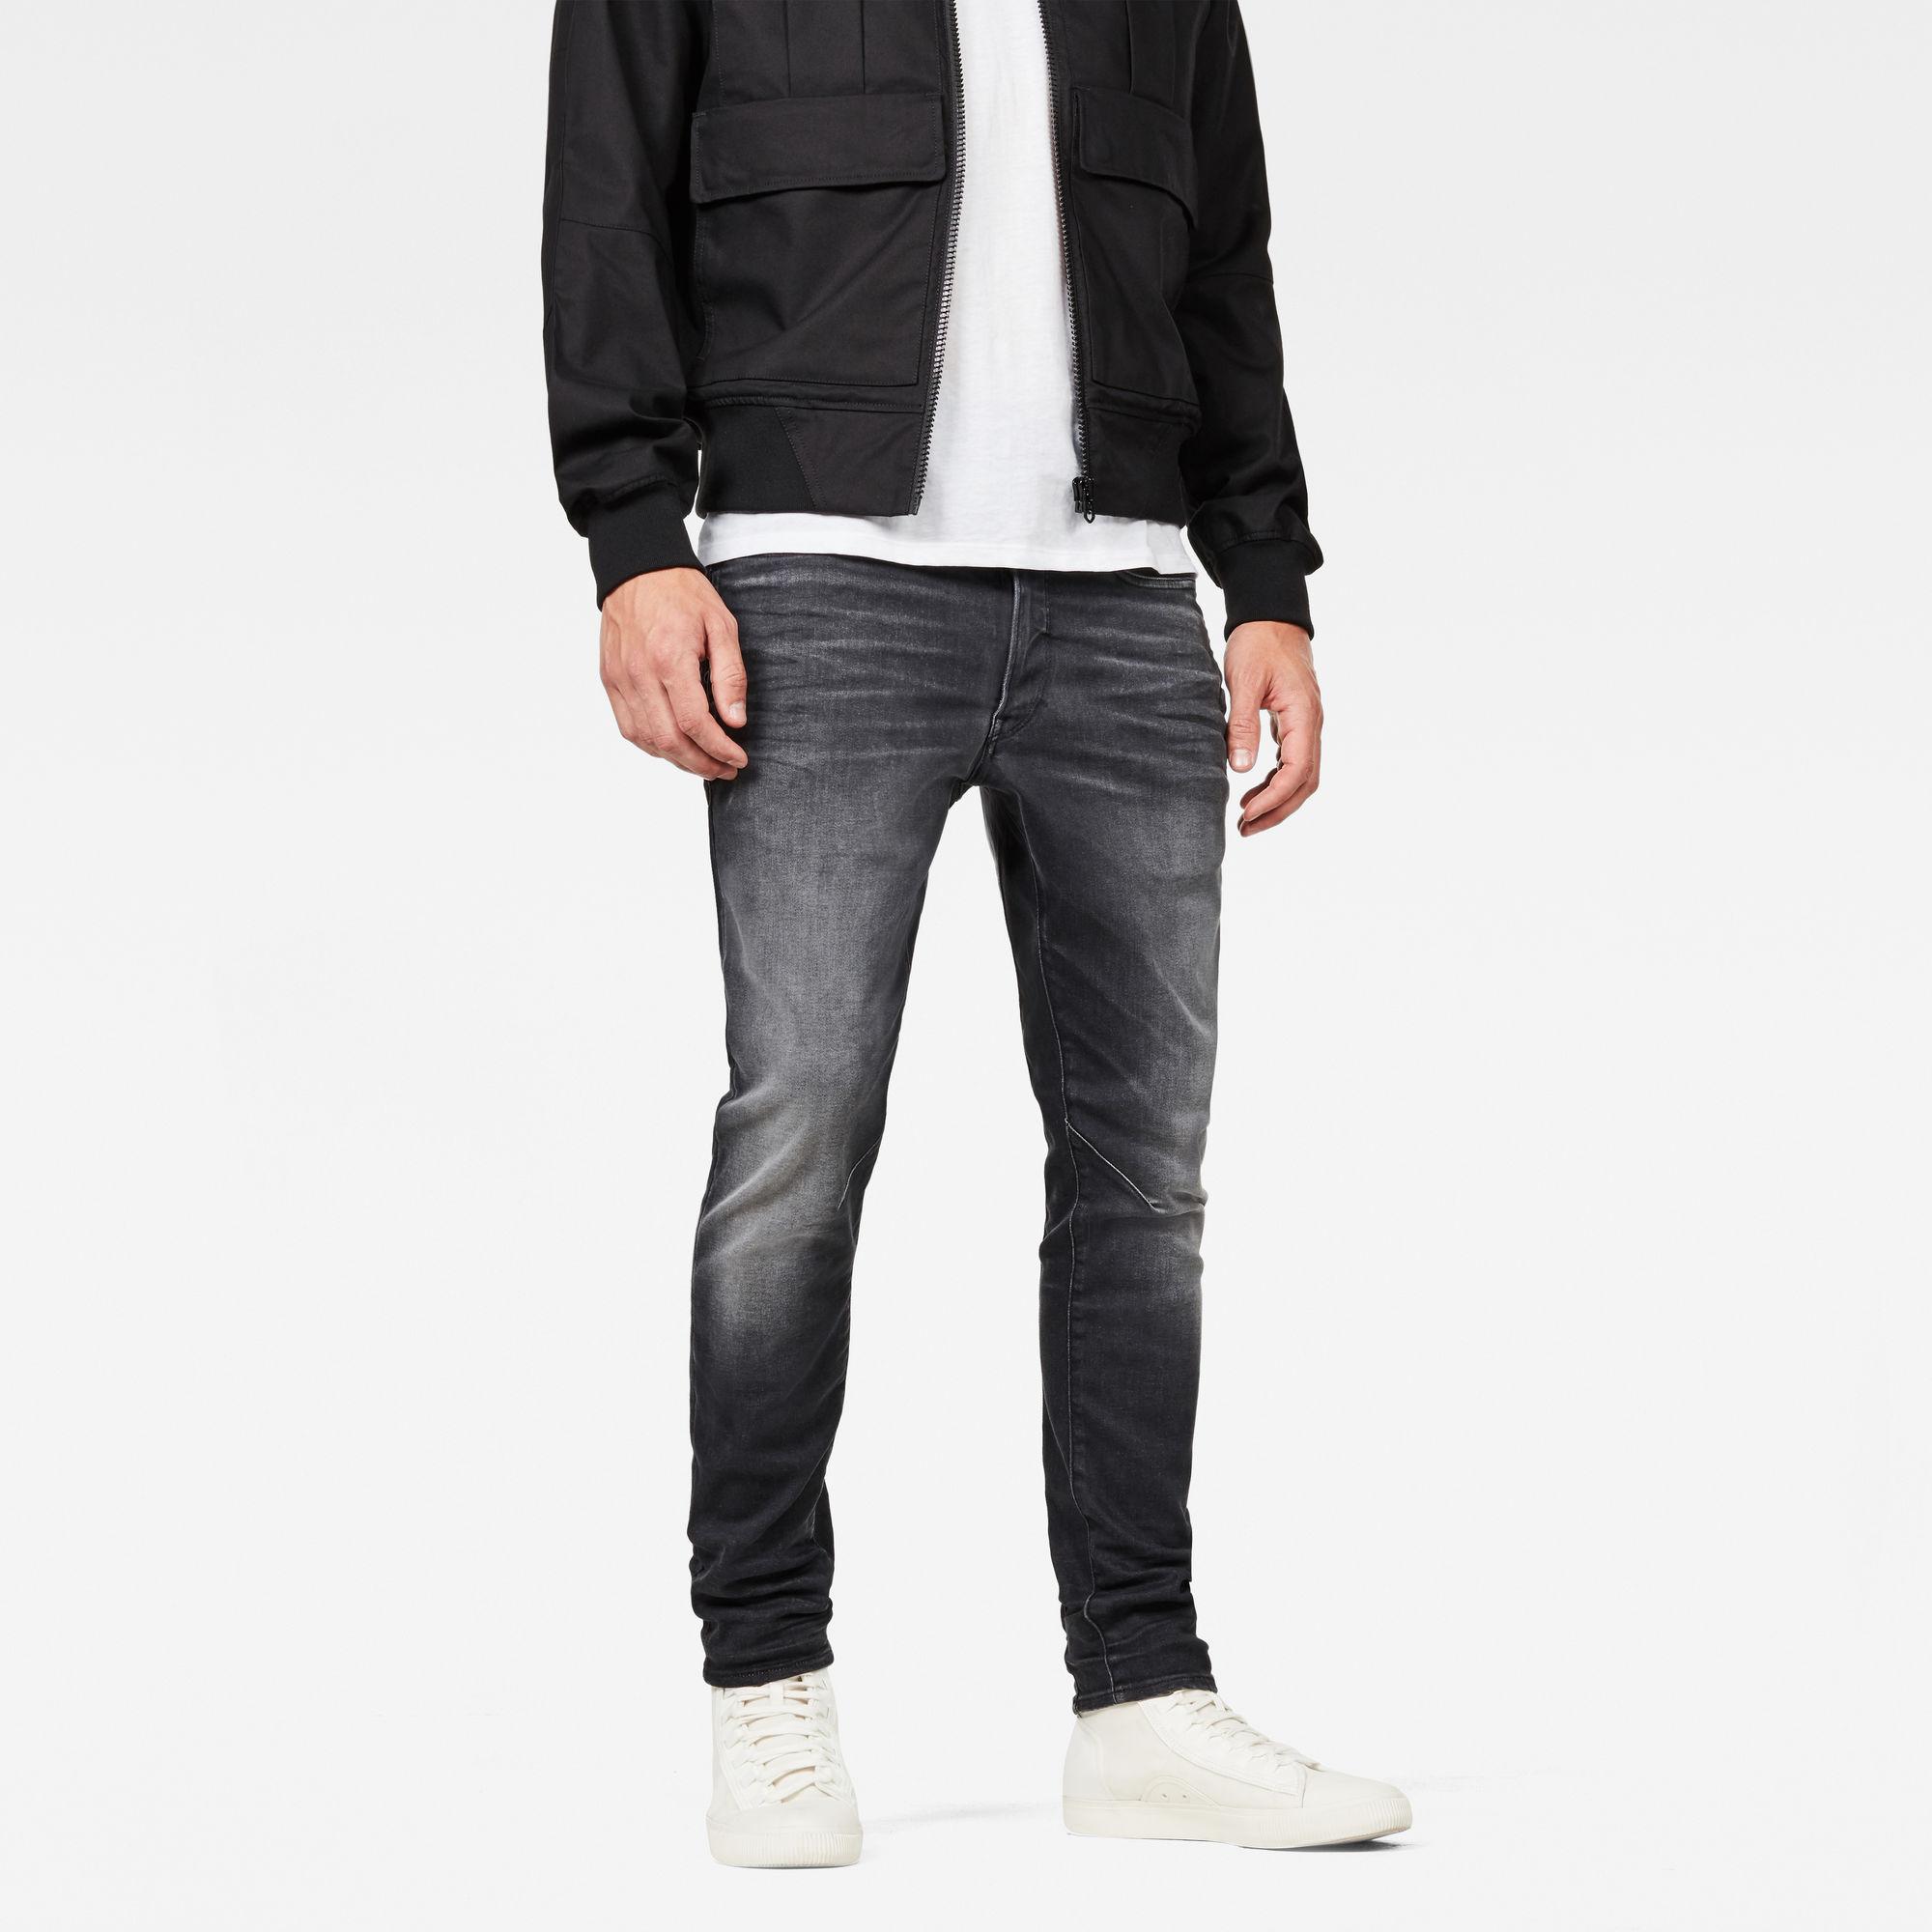 G-Star RAW Heren D-Staq 3D Slim Jeans Grijs